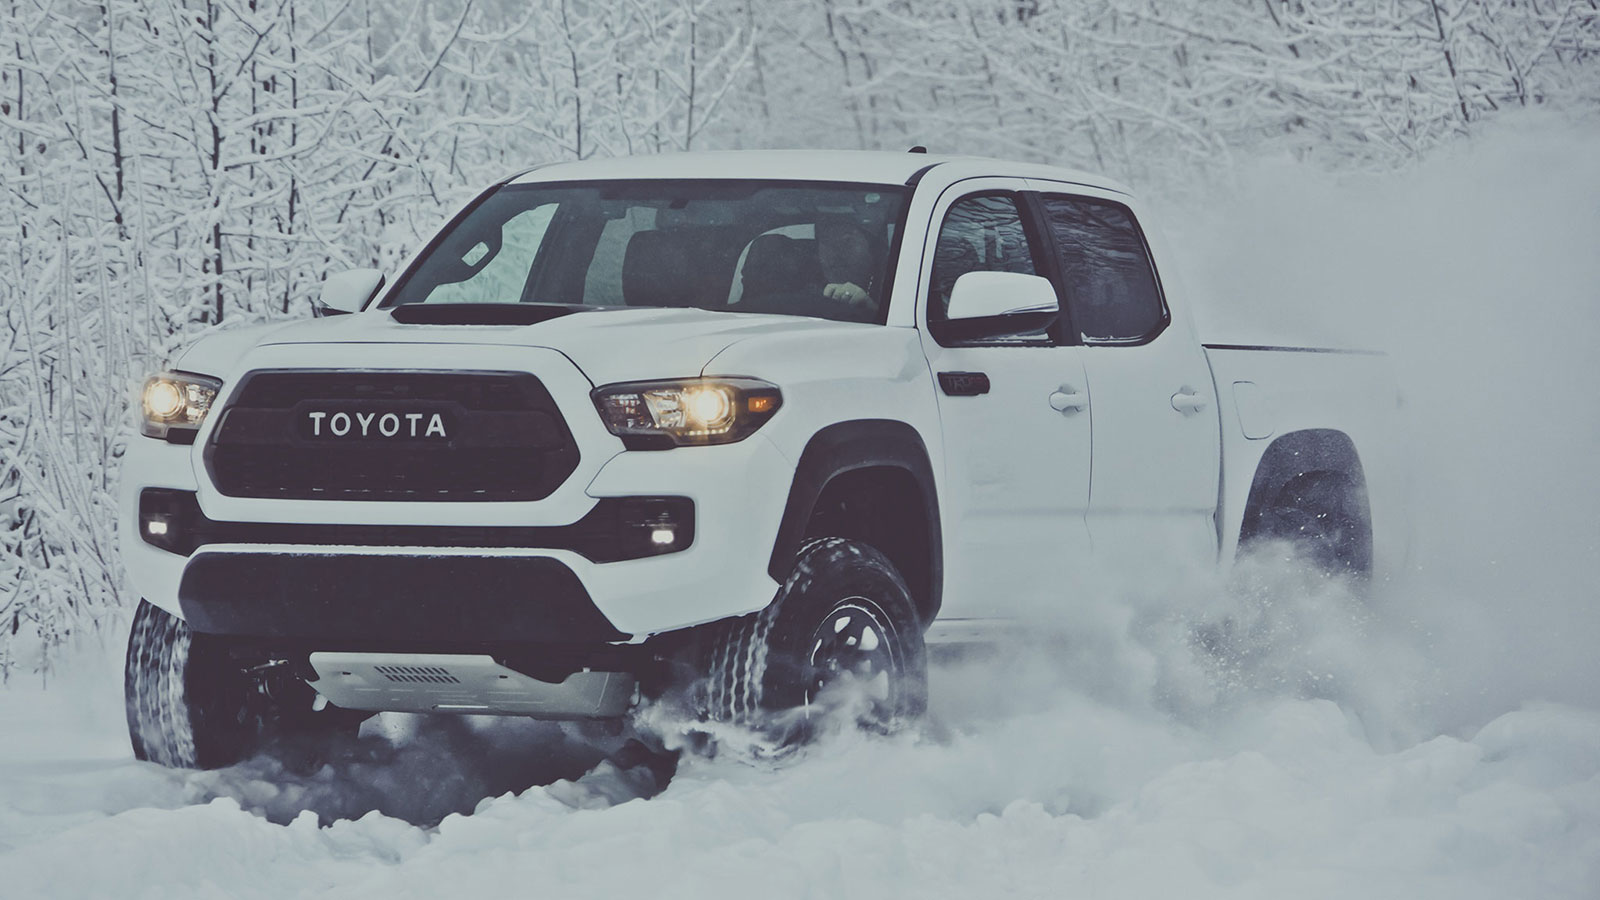 2017-Toyota-Tacoma-TRD-Pro-3